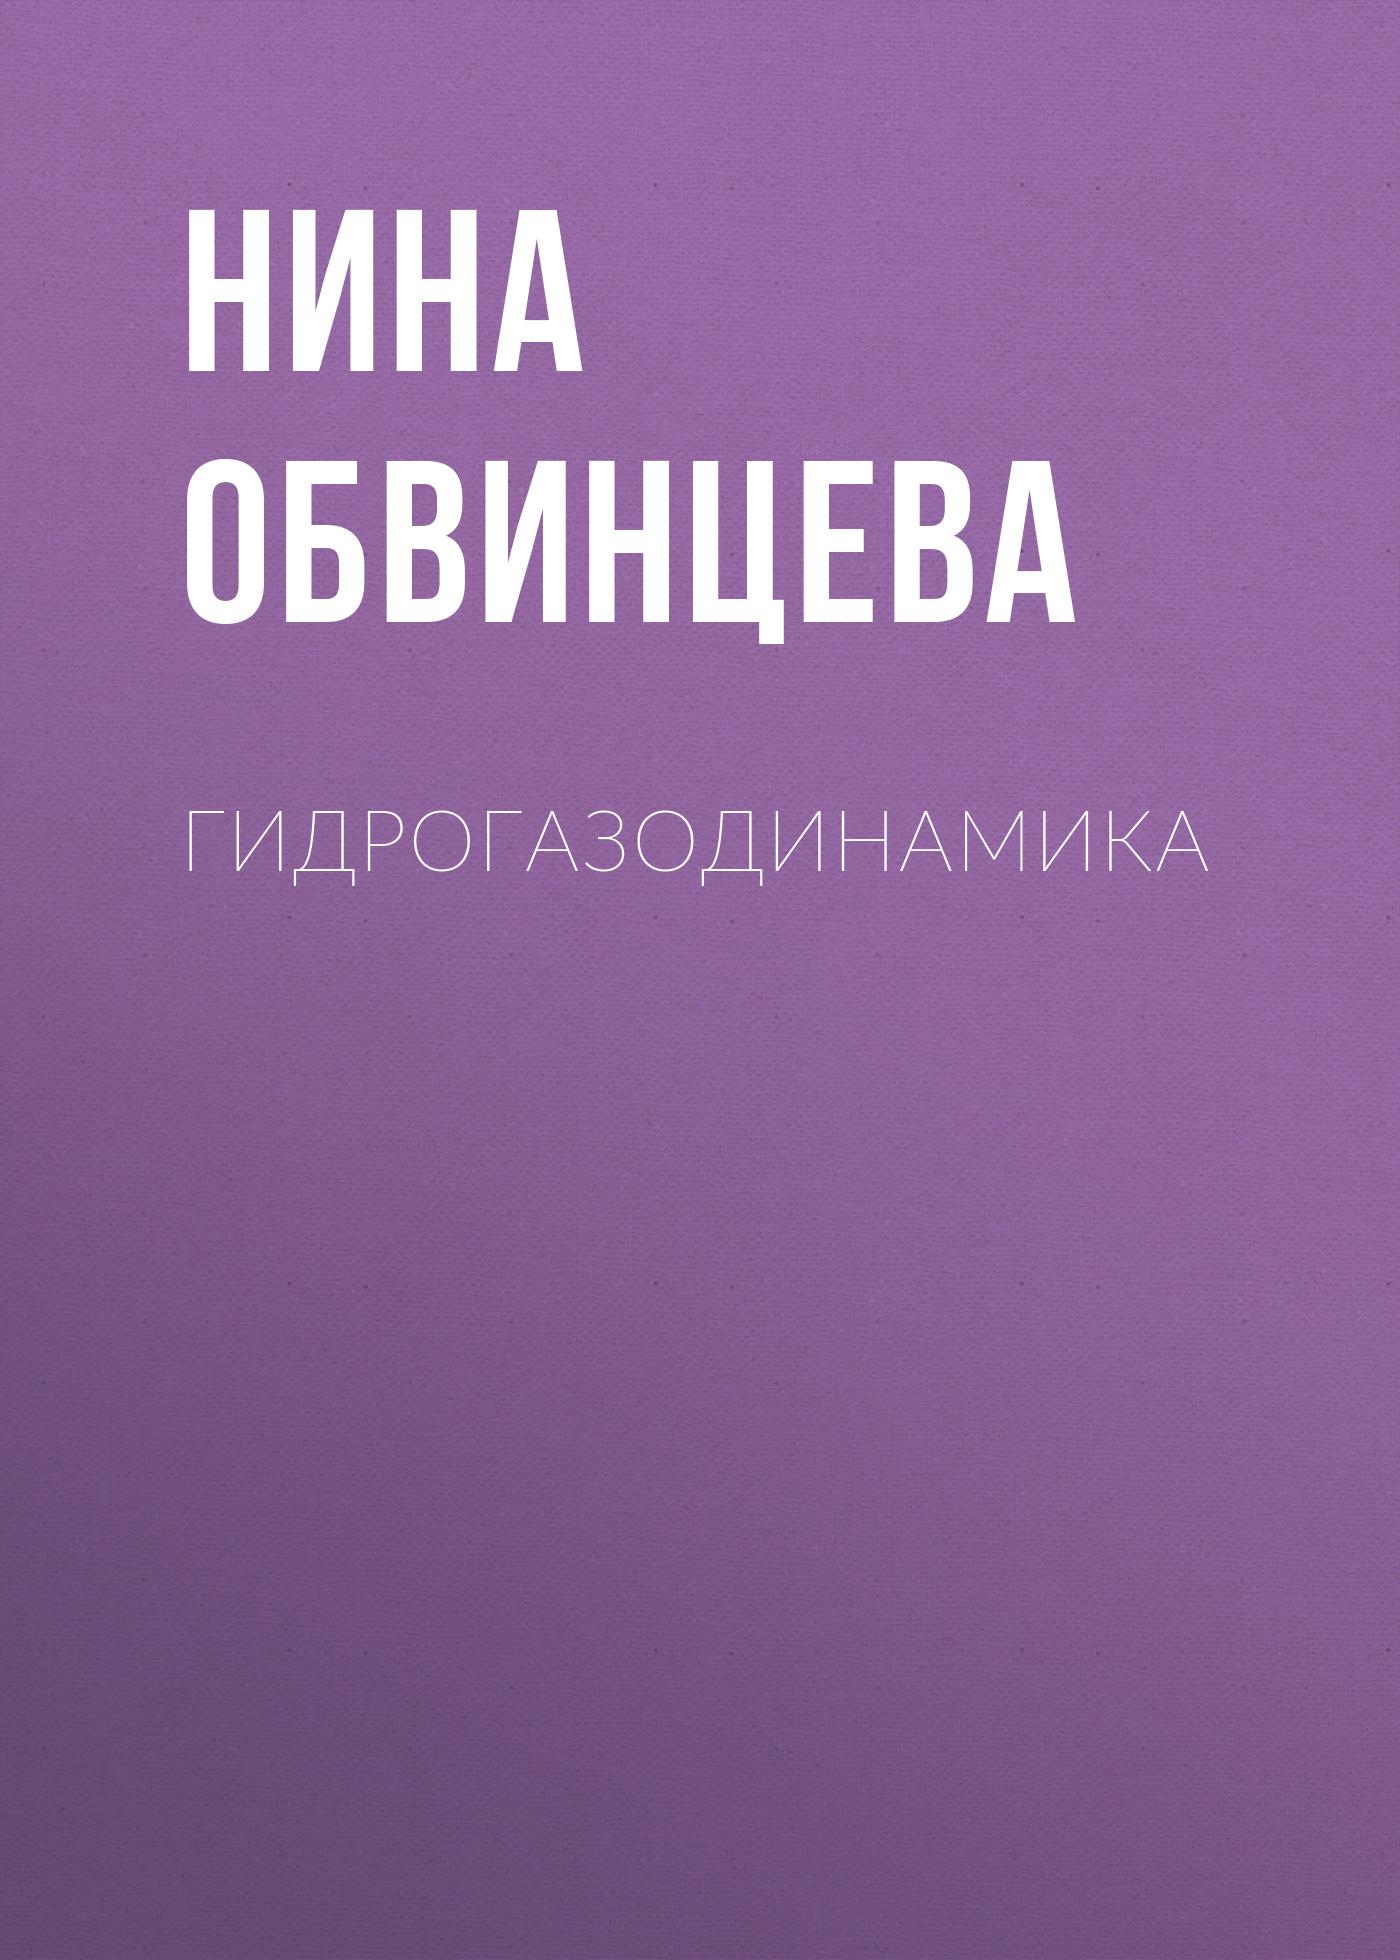 Нина Обвинцева Гидрогазодинамика